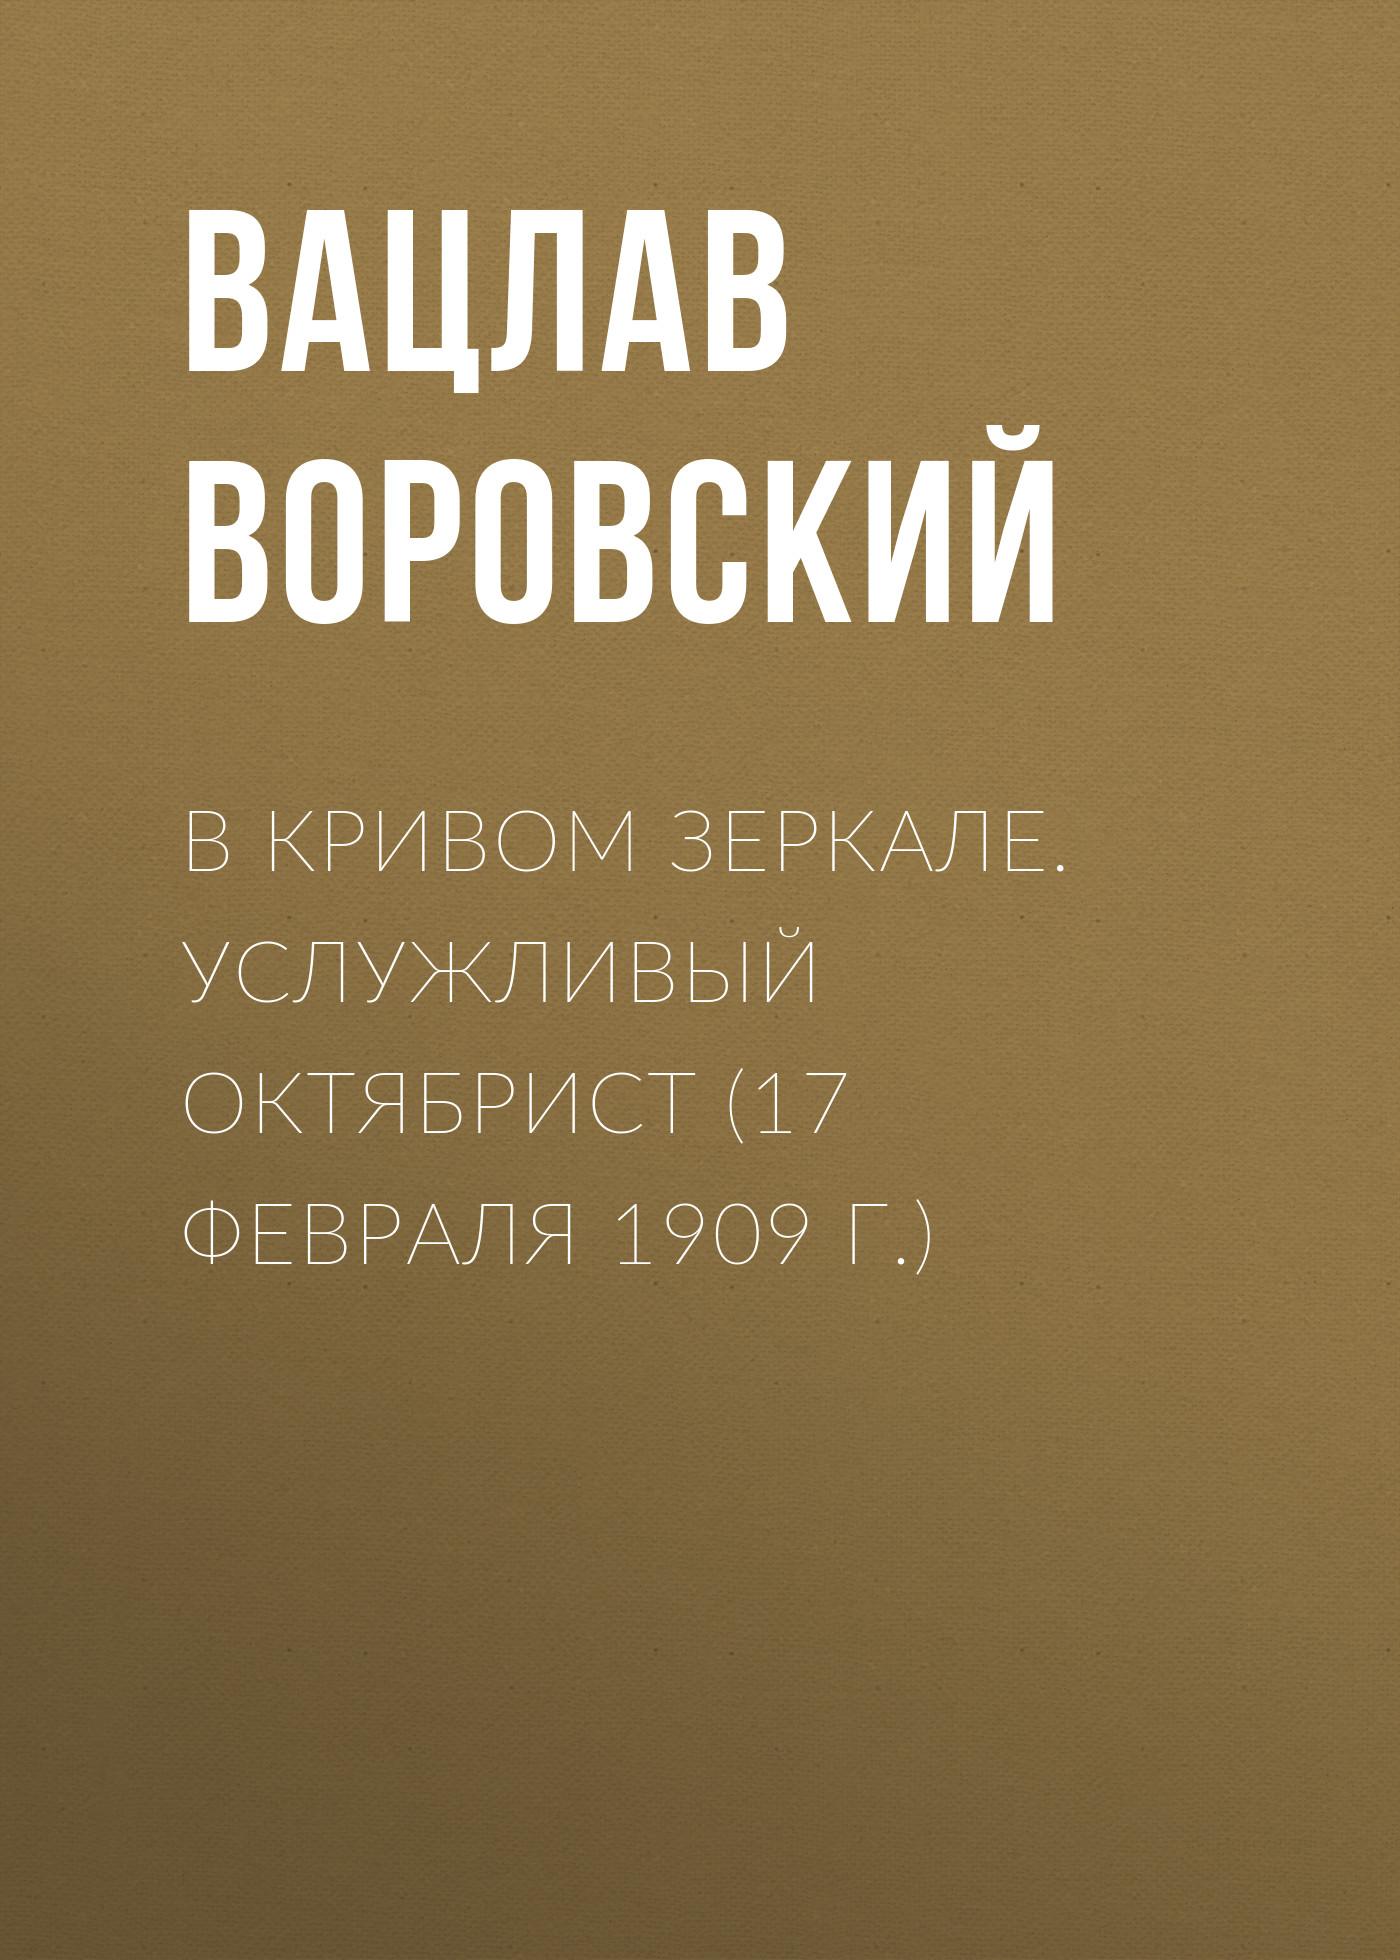 Вацлав Воровский В кривом зеркале. Услужливый октябрист (17 февраля 1909 г.) вацлав воровский цыпочка